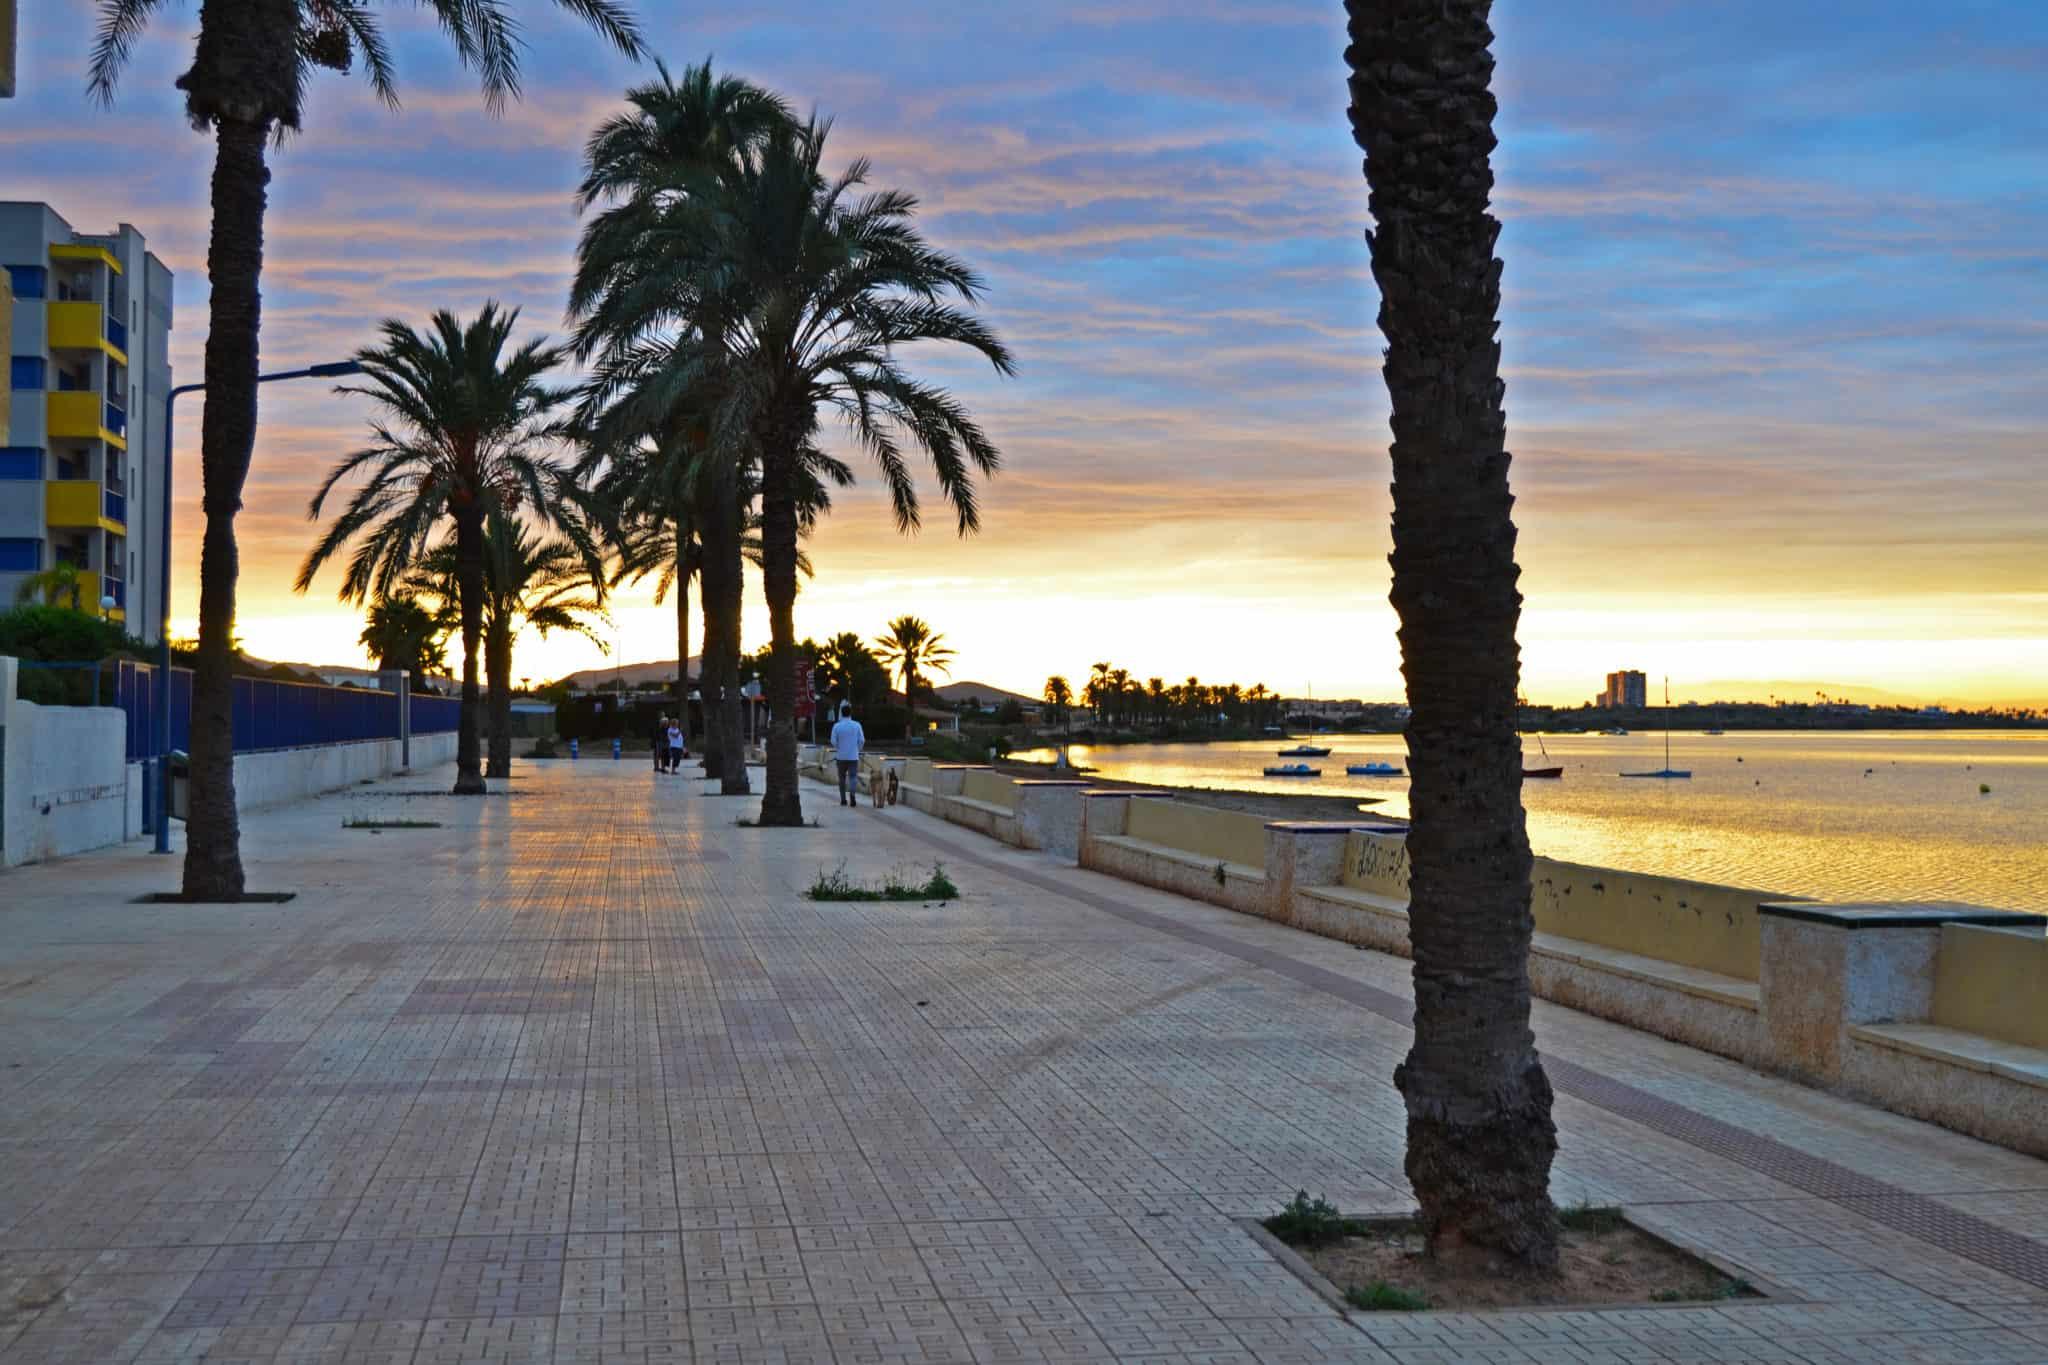 Sunset on the Playa Honda promenade